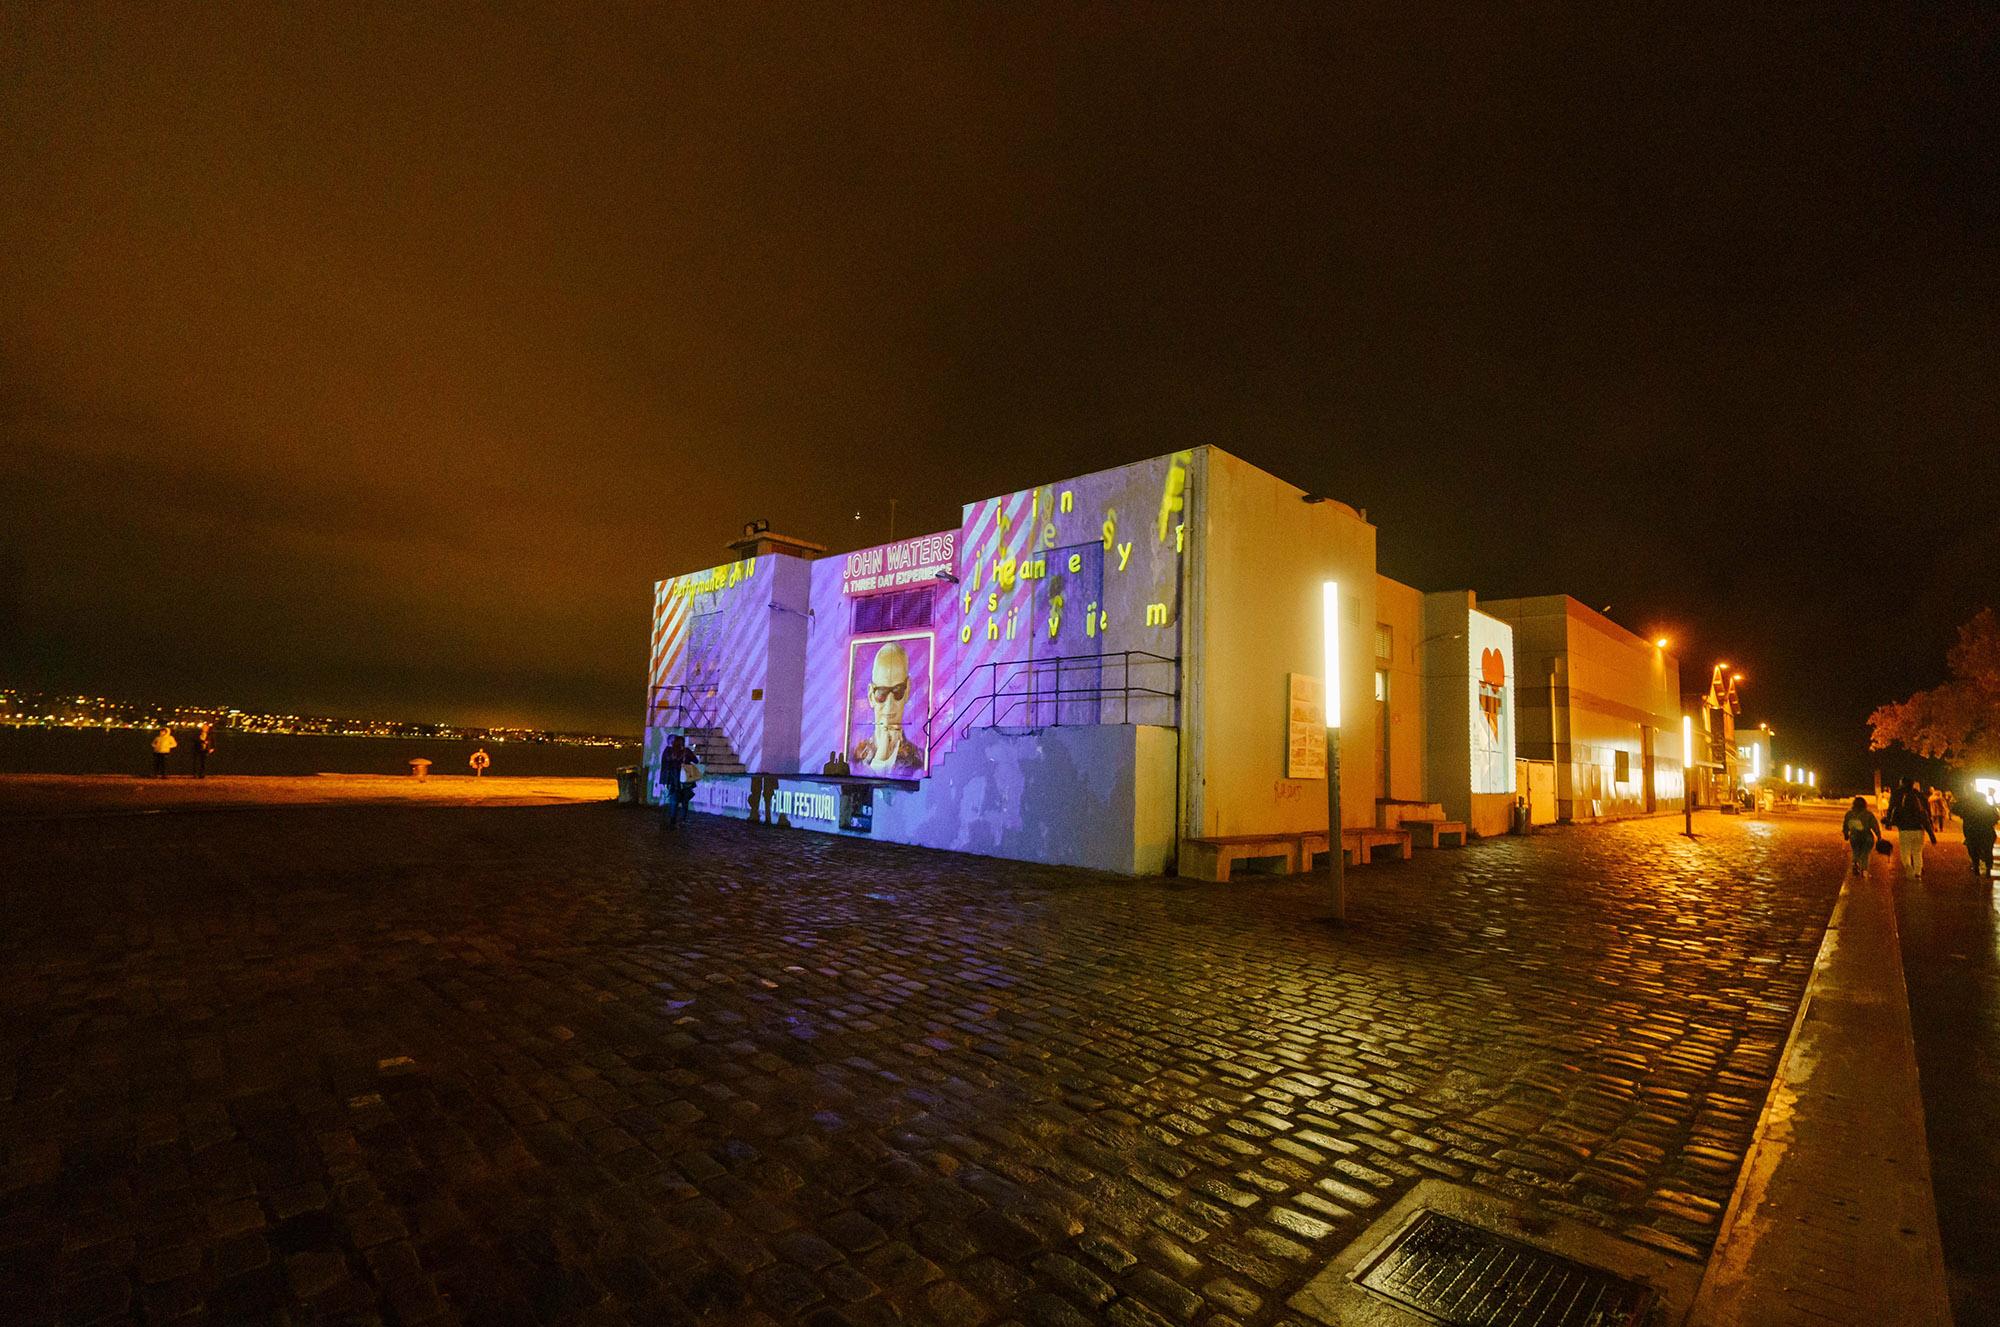 Video mapping installation byStathis Mitsiosat the Port of Thessaloniki